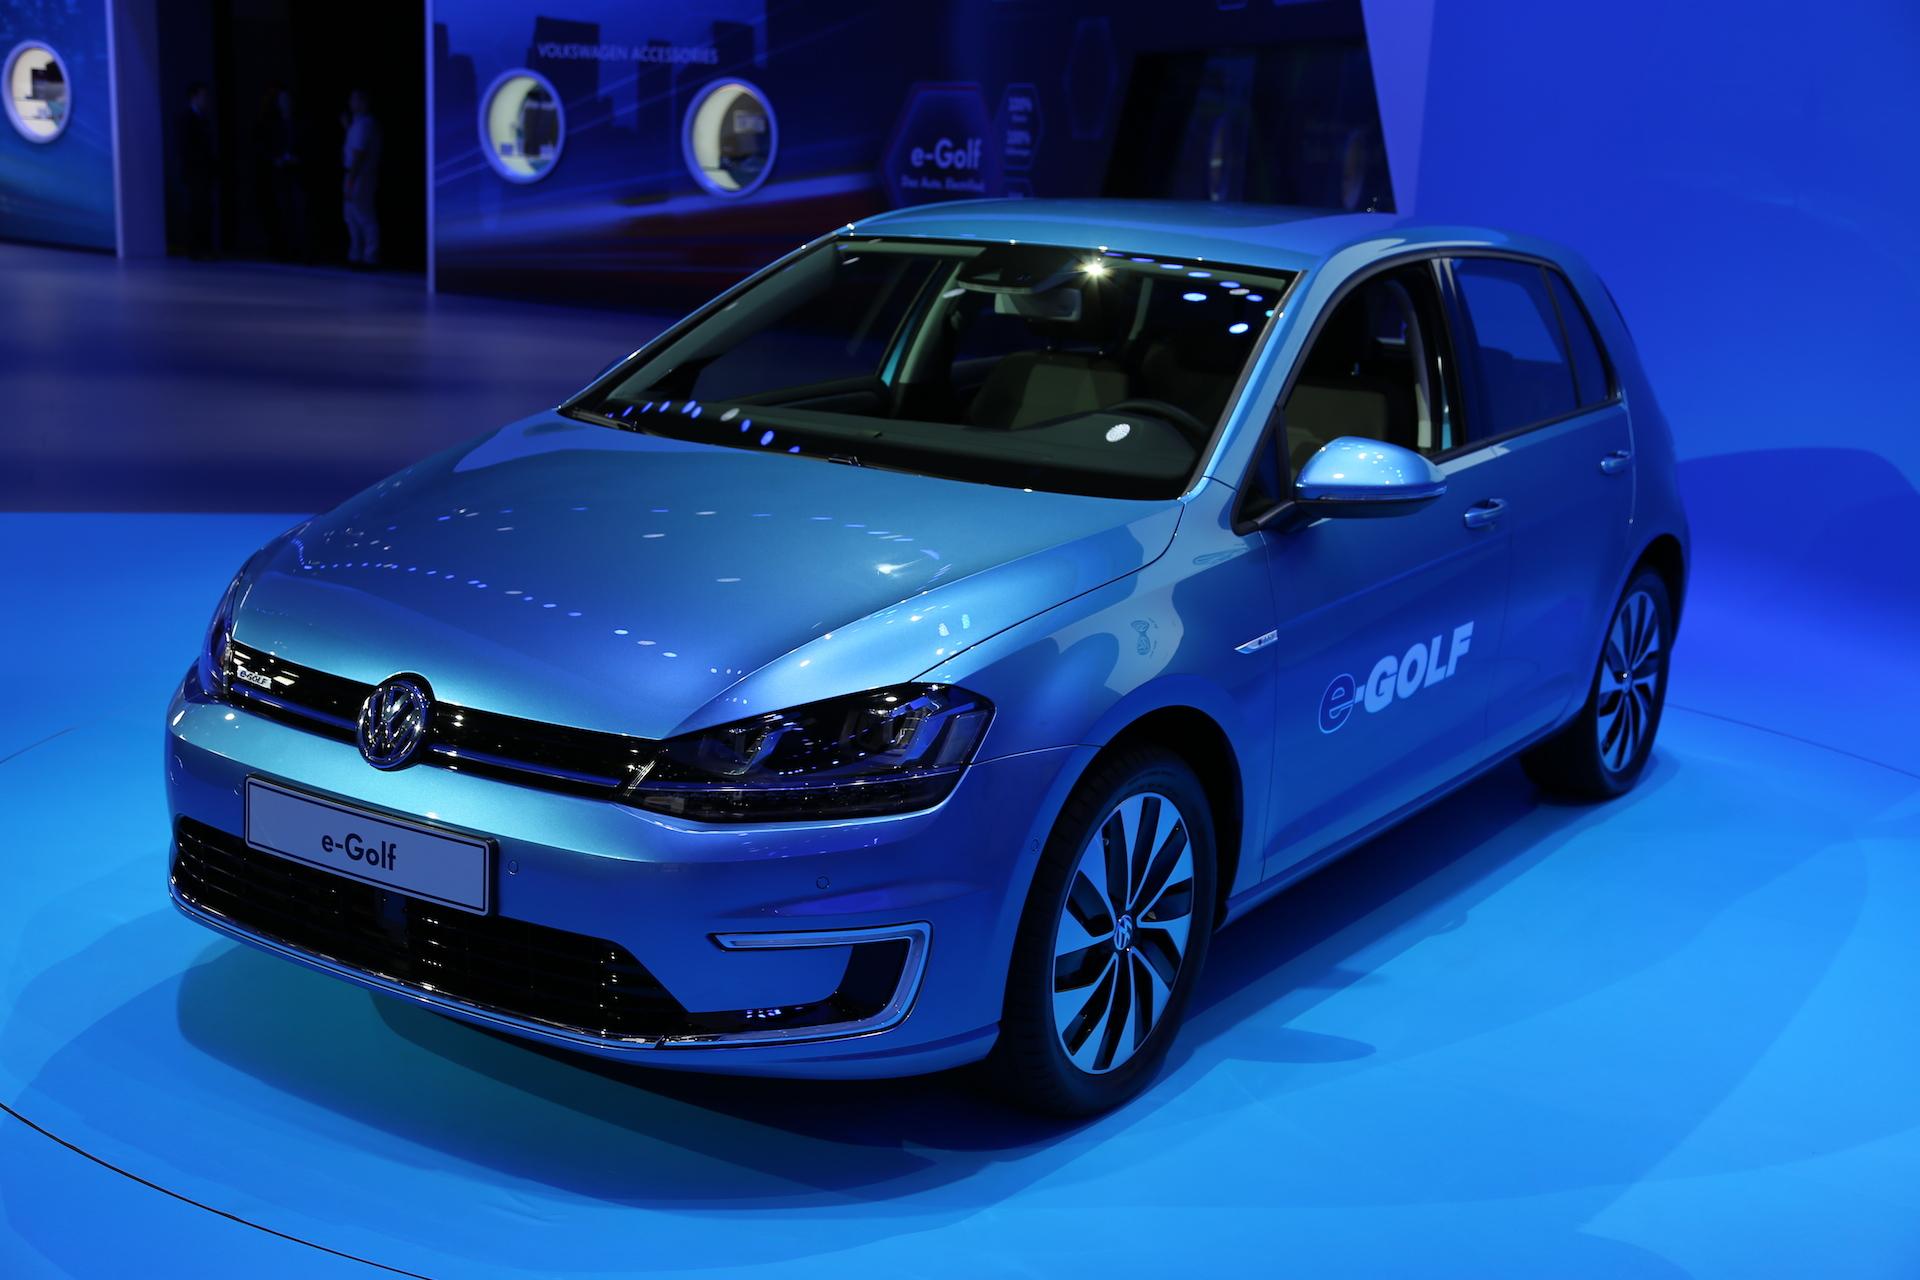 2015 volkswagen e golf electric car preview and live photos 2013 l a auto show. Black Bedroom Furniture Sets. Home Design Ideas